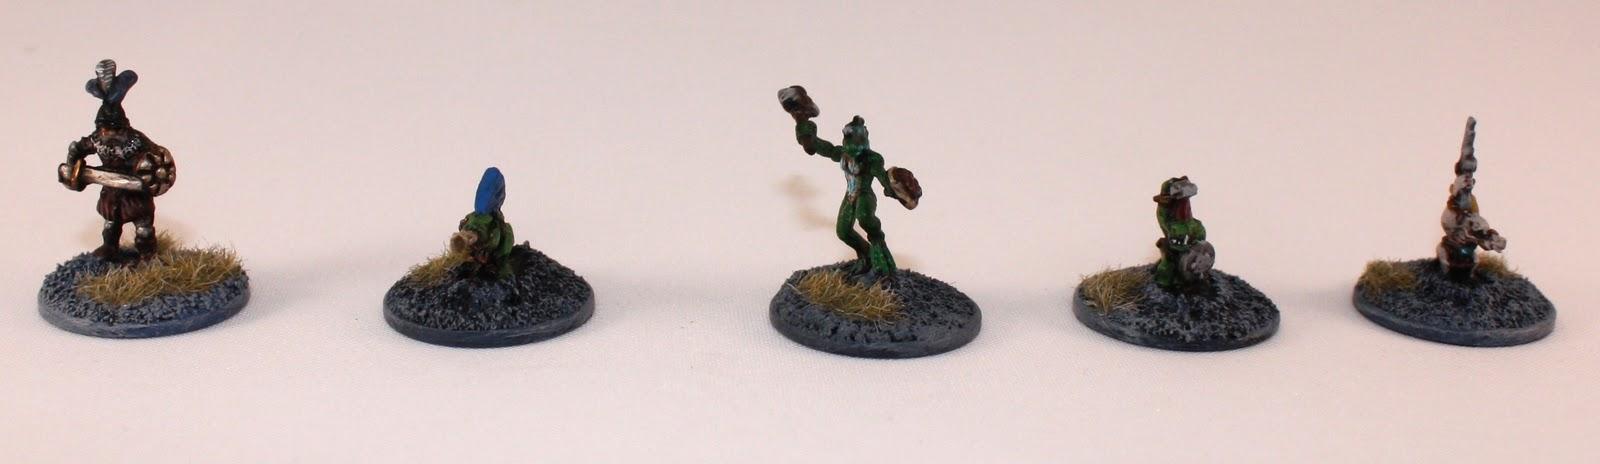 my 15mm Lizardmen Warband start - Heroes IMG_3136